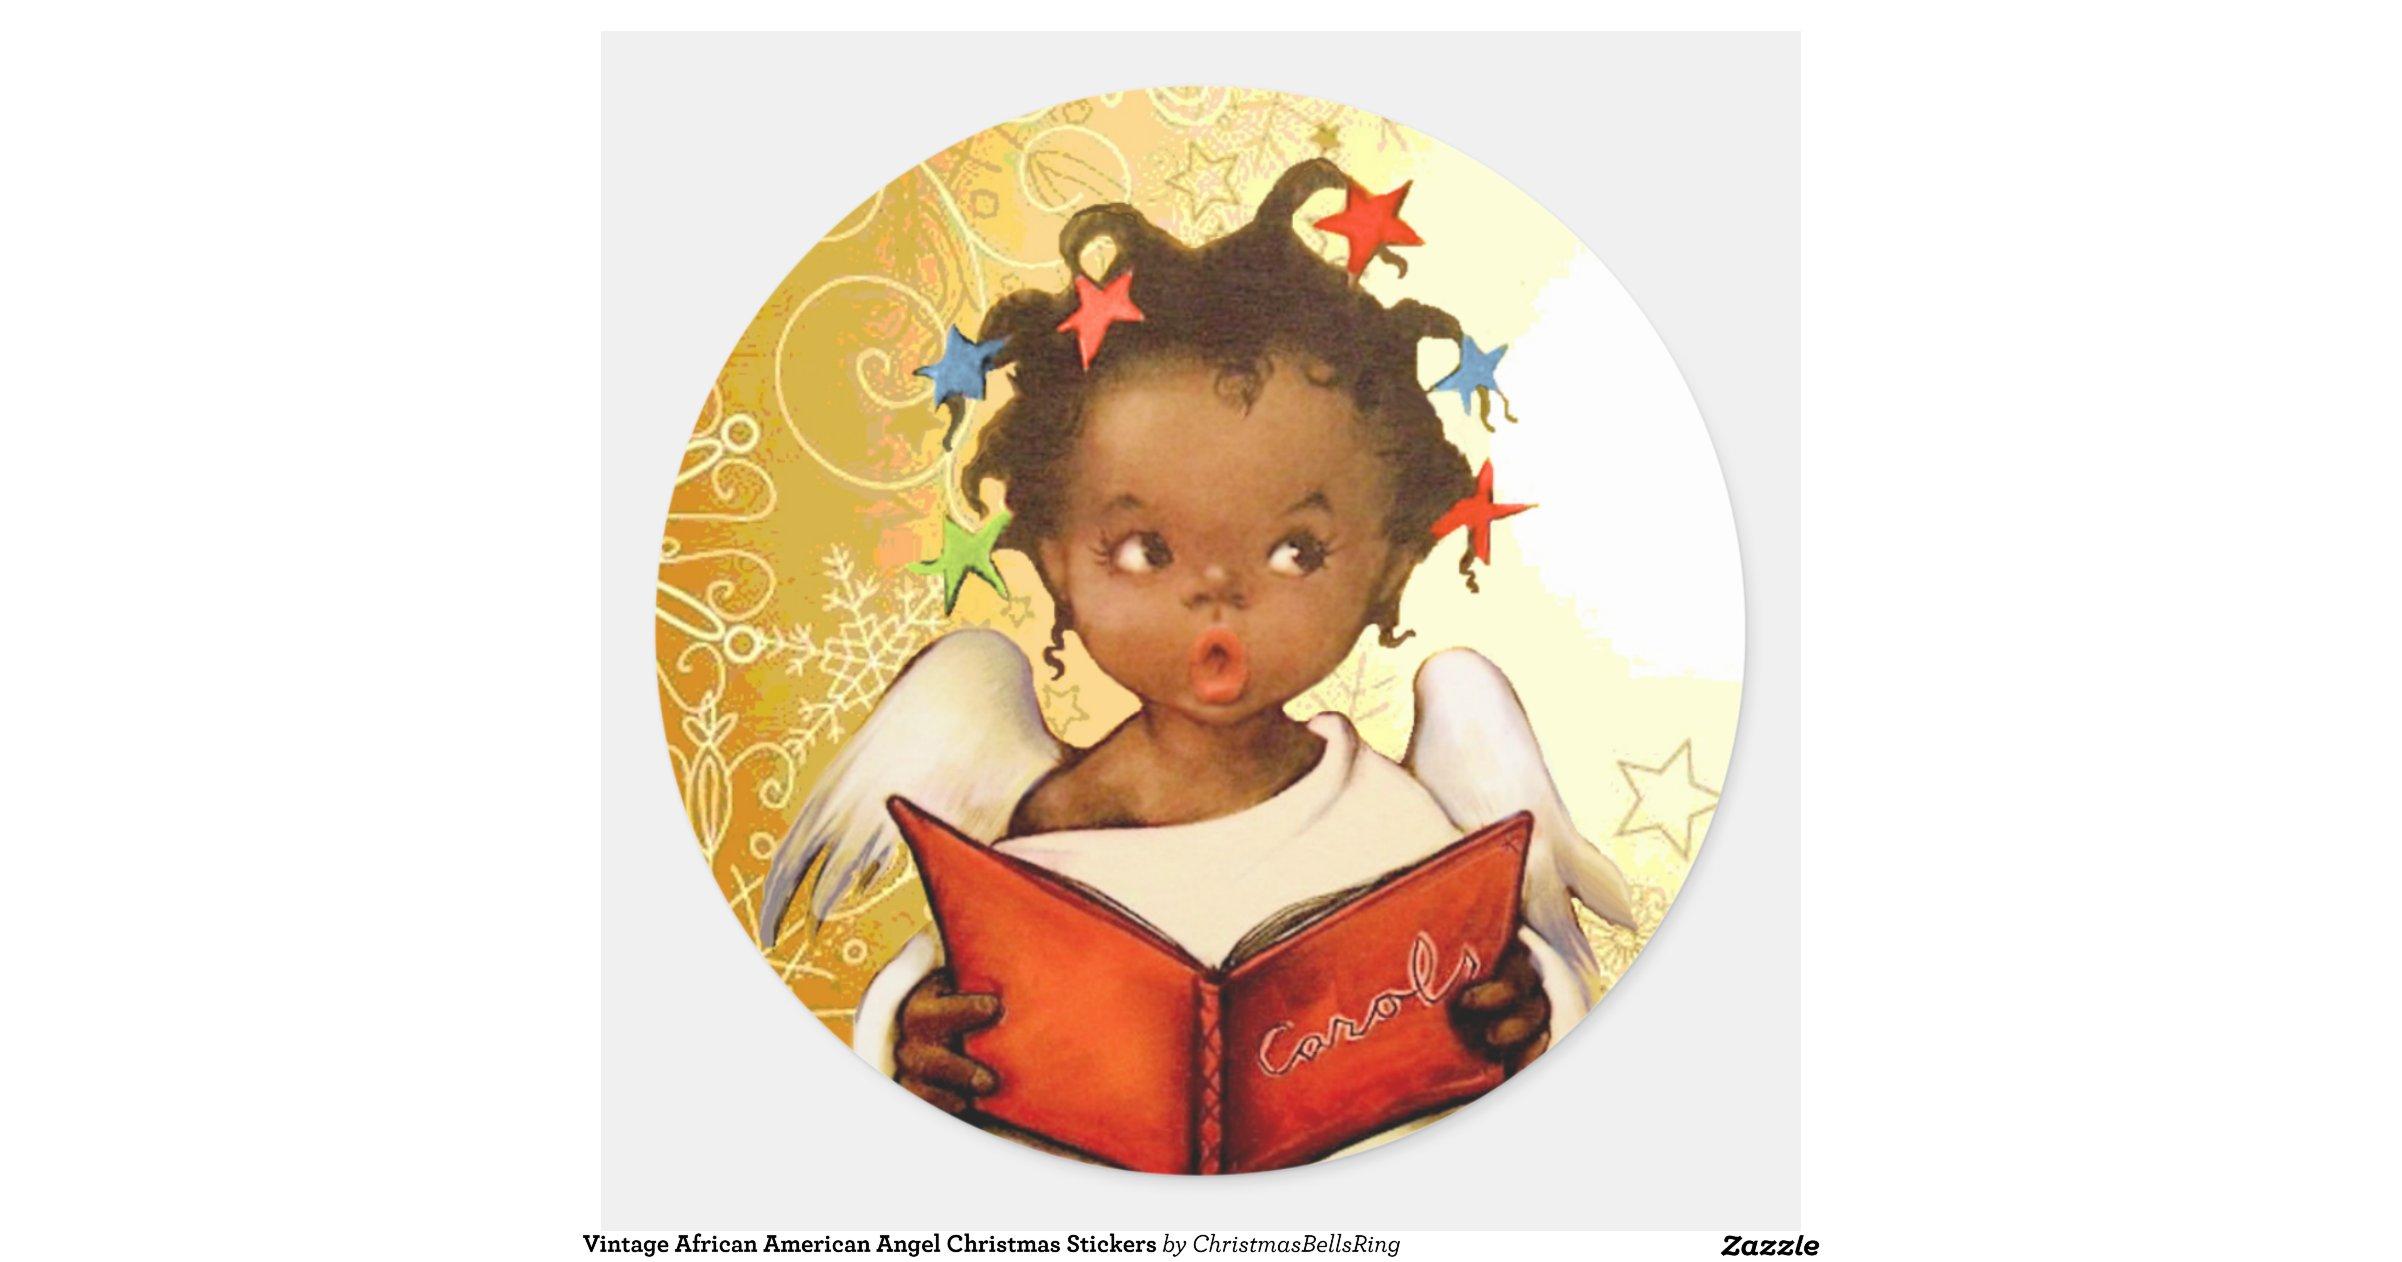 Vintageafricanamericanangelchristmasstickers